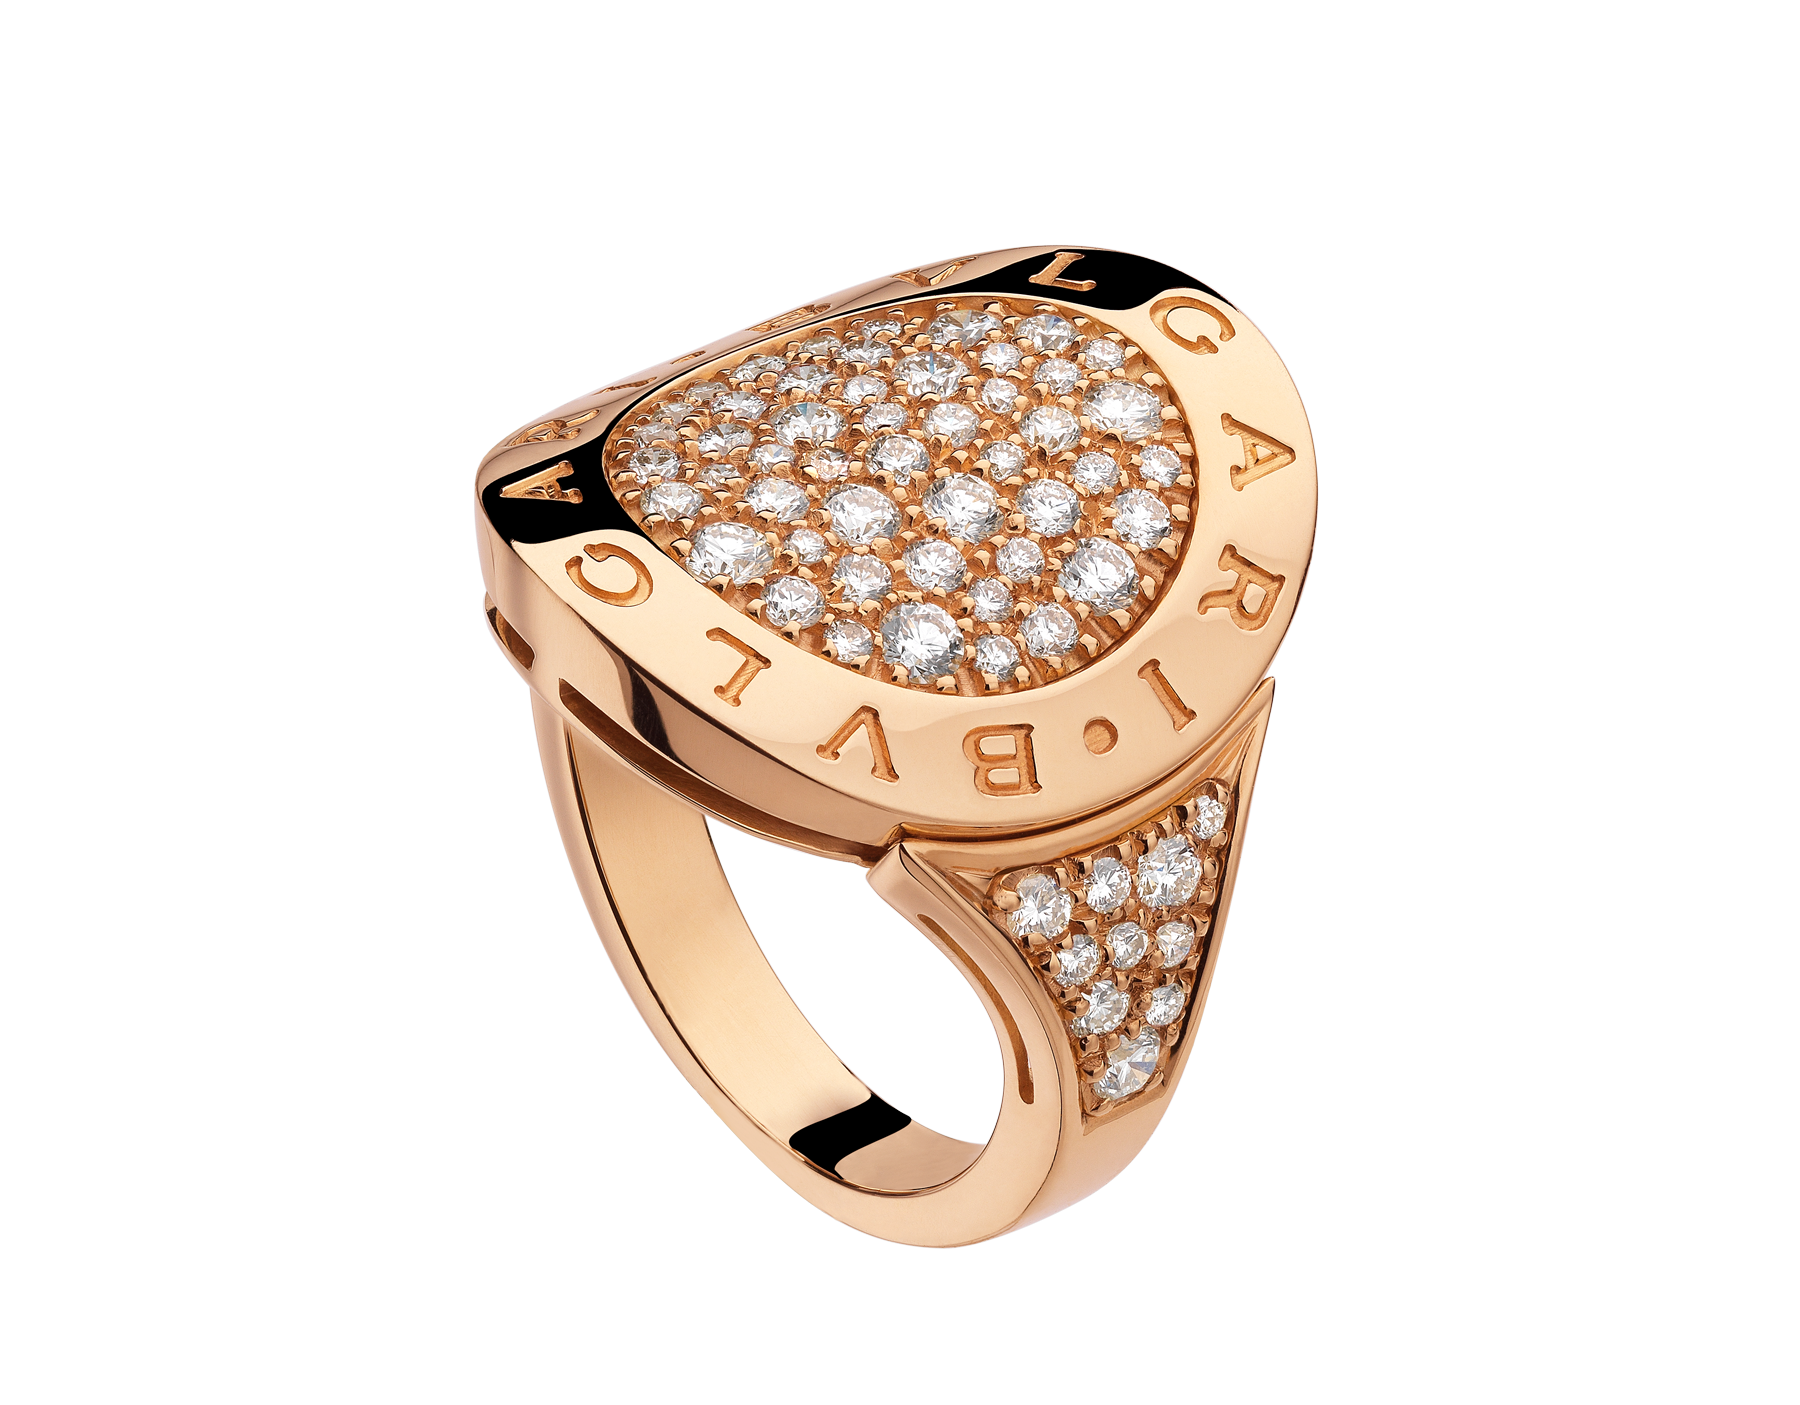 bvlgari bvlgari rose gold diamond ring an854862 discover italian jewelry and other luxury goods